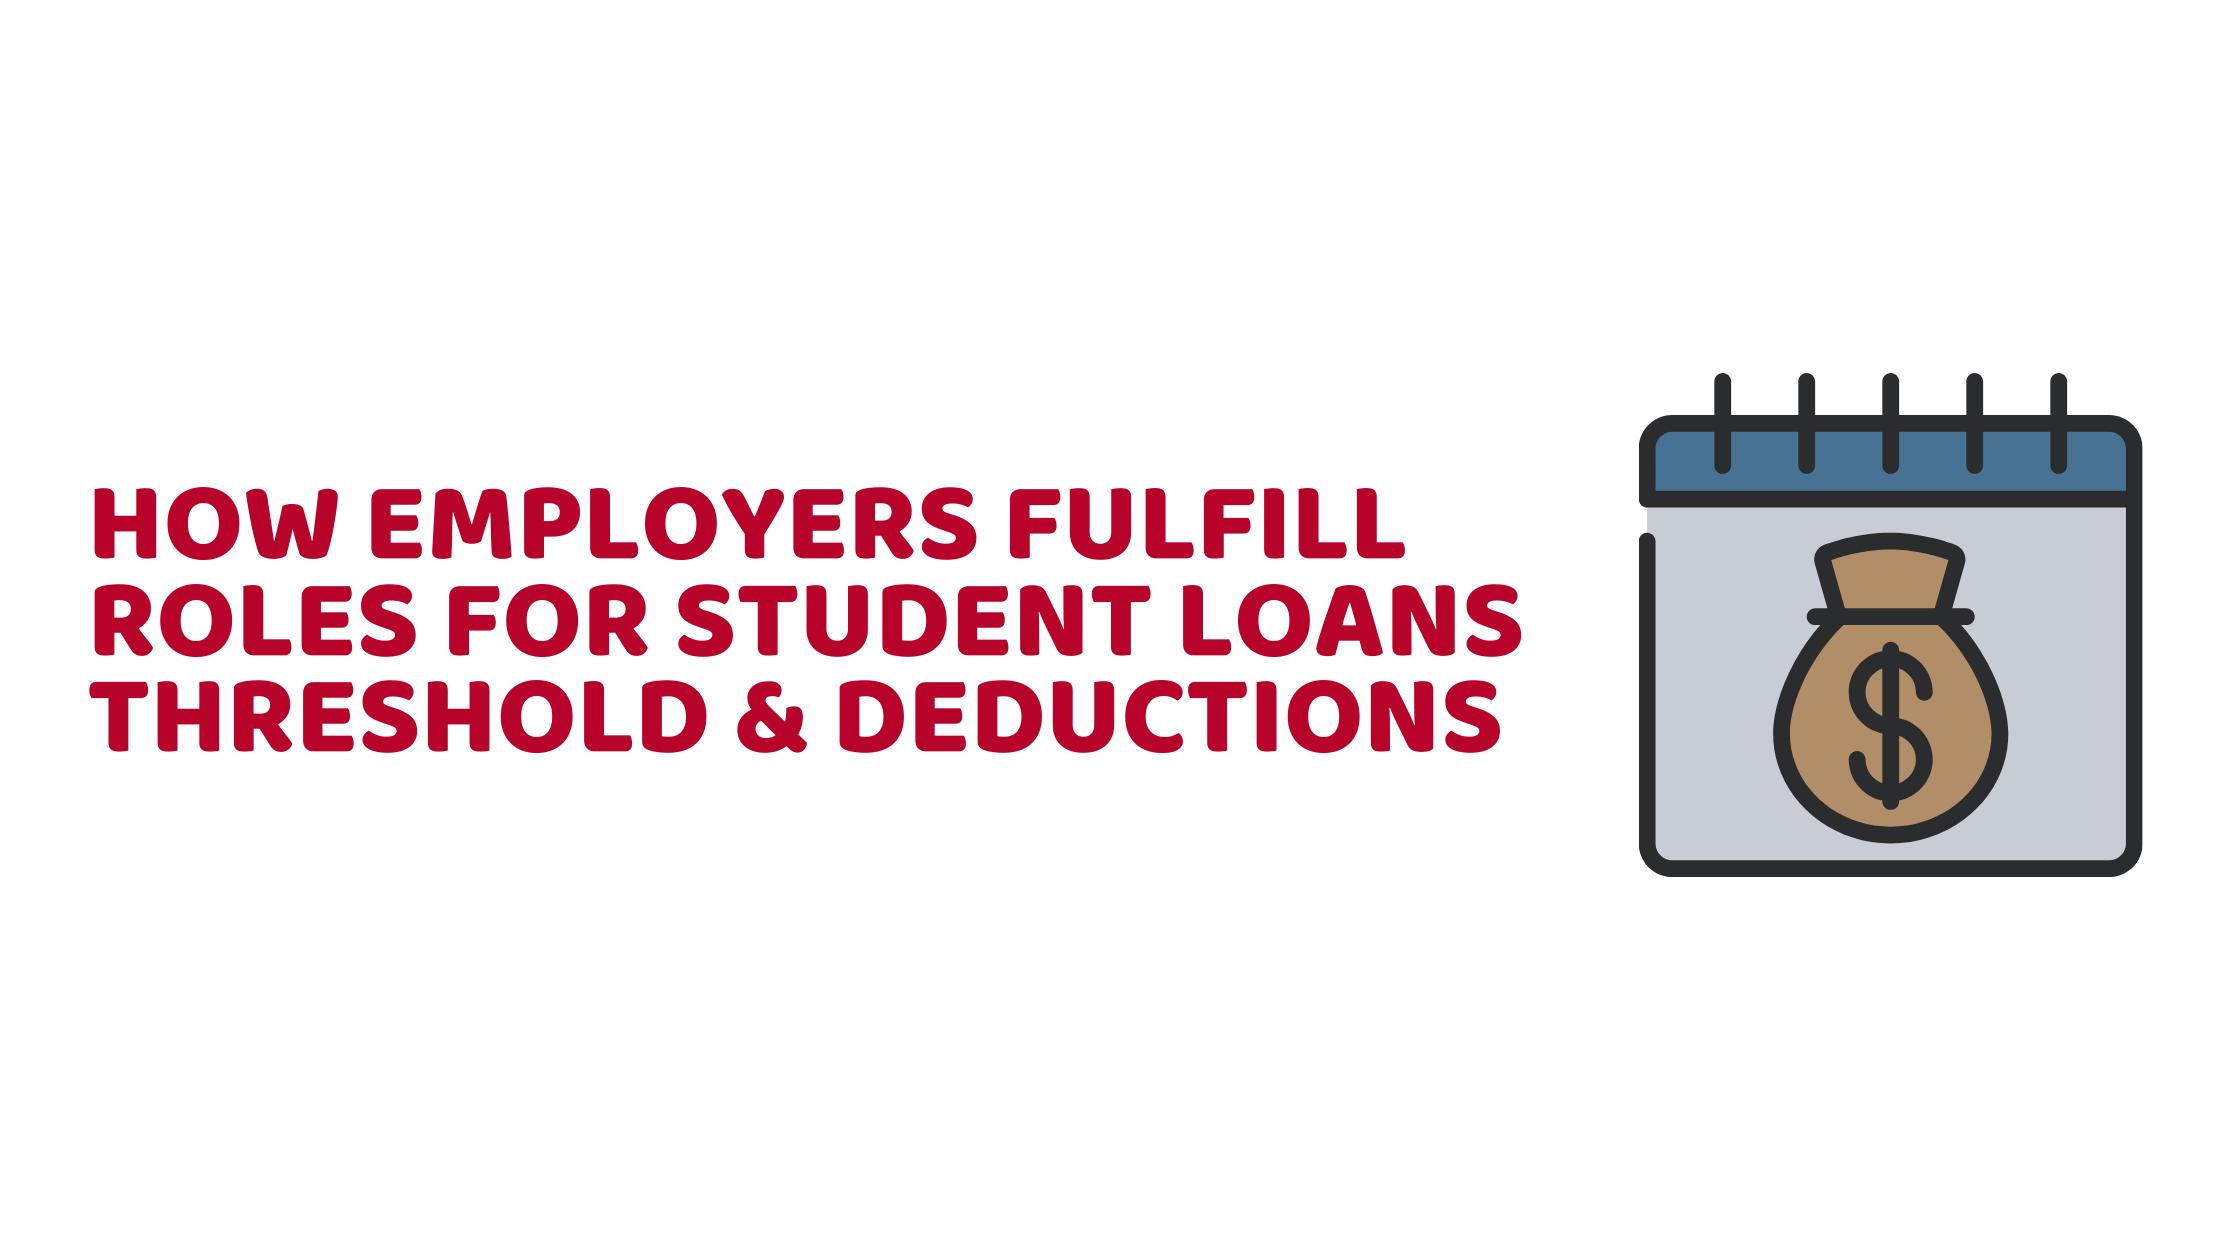 Student Loans Threshold